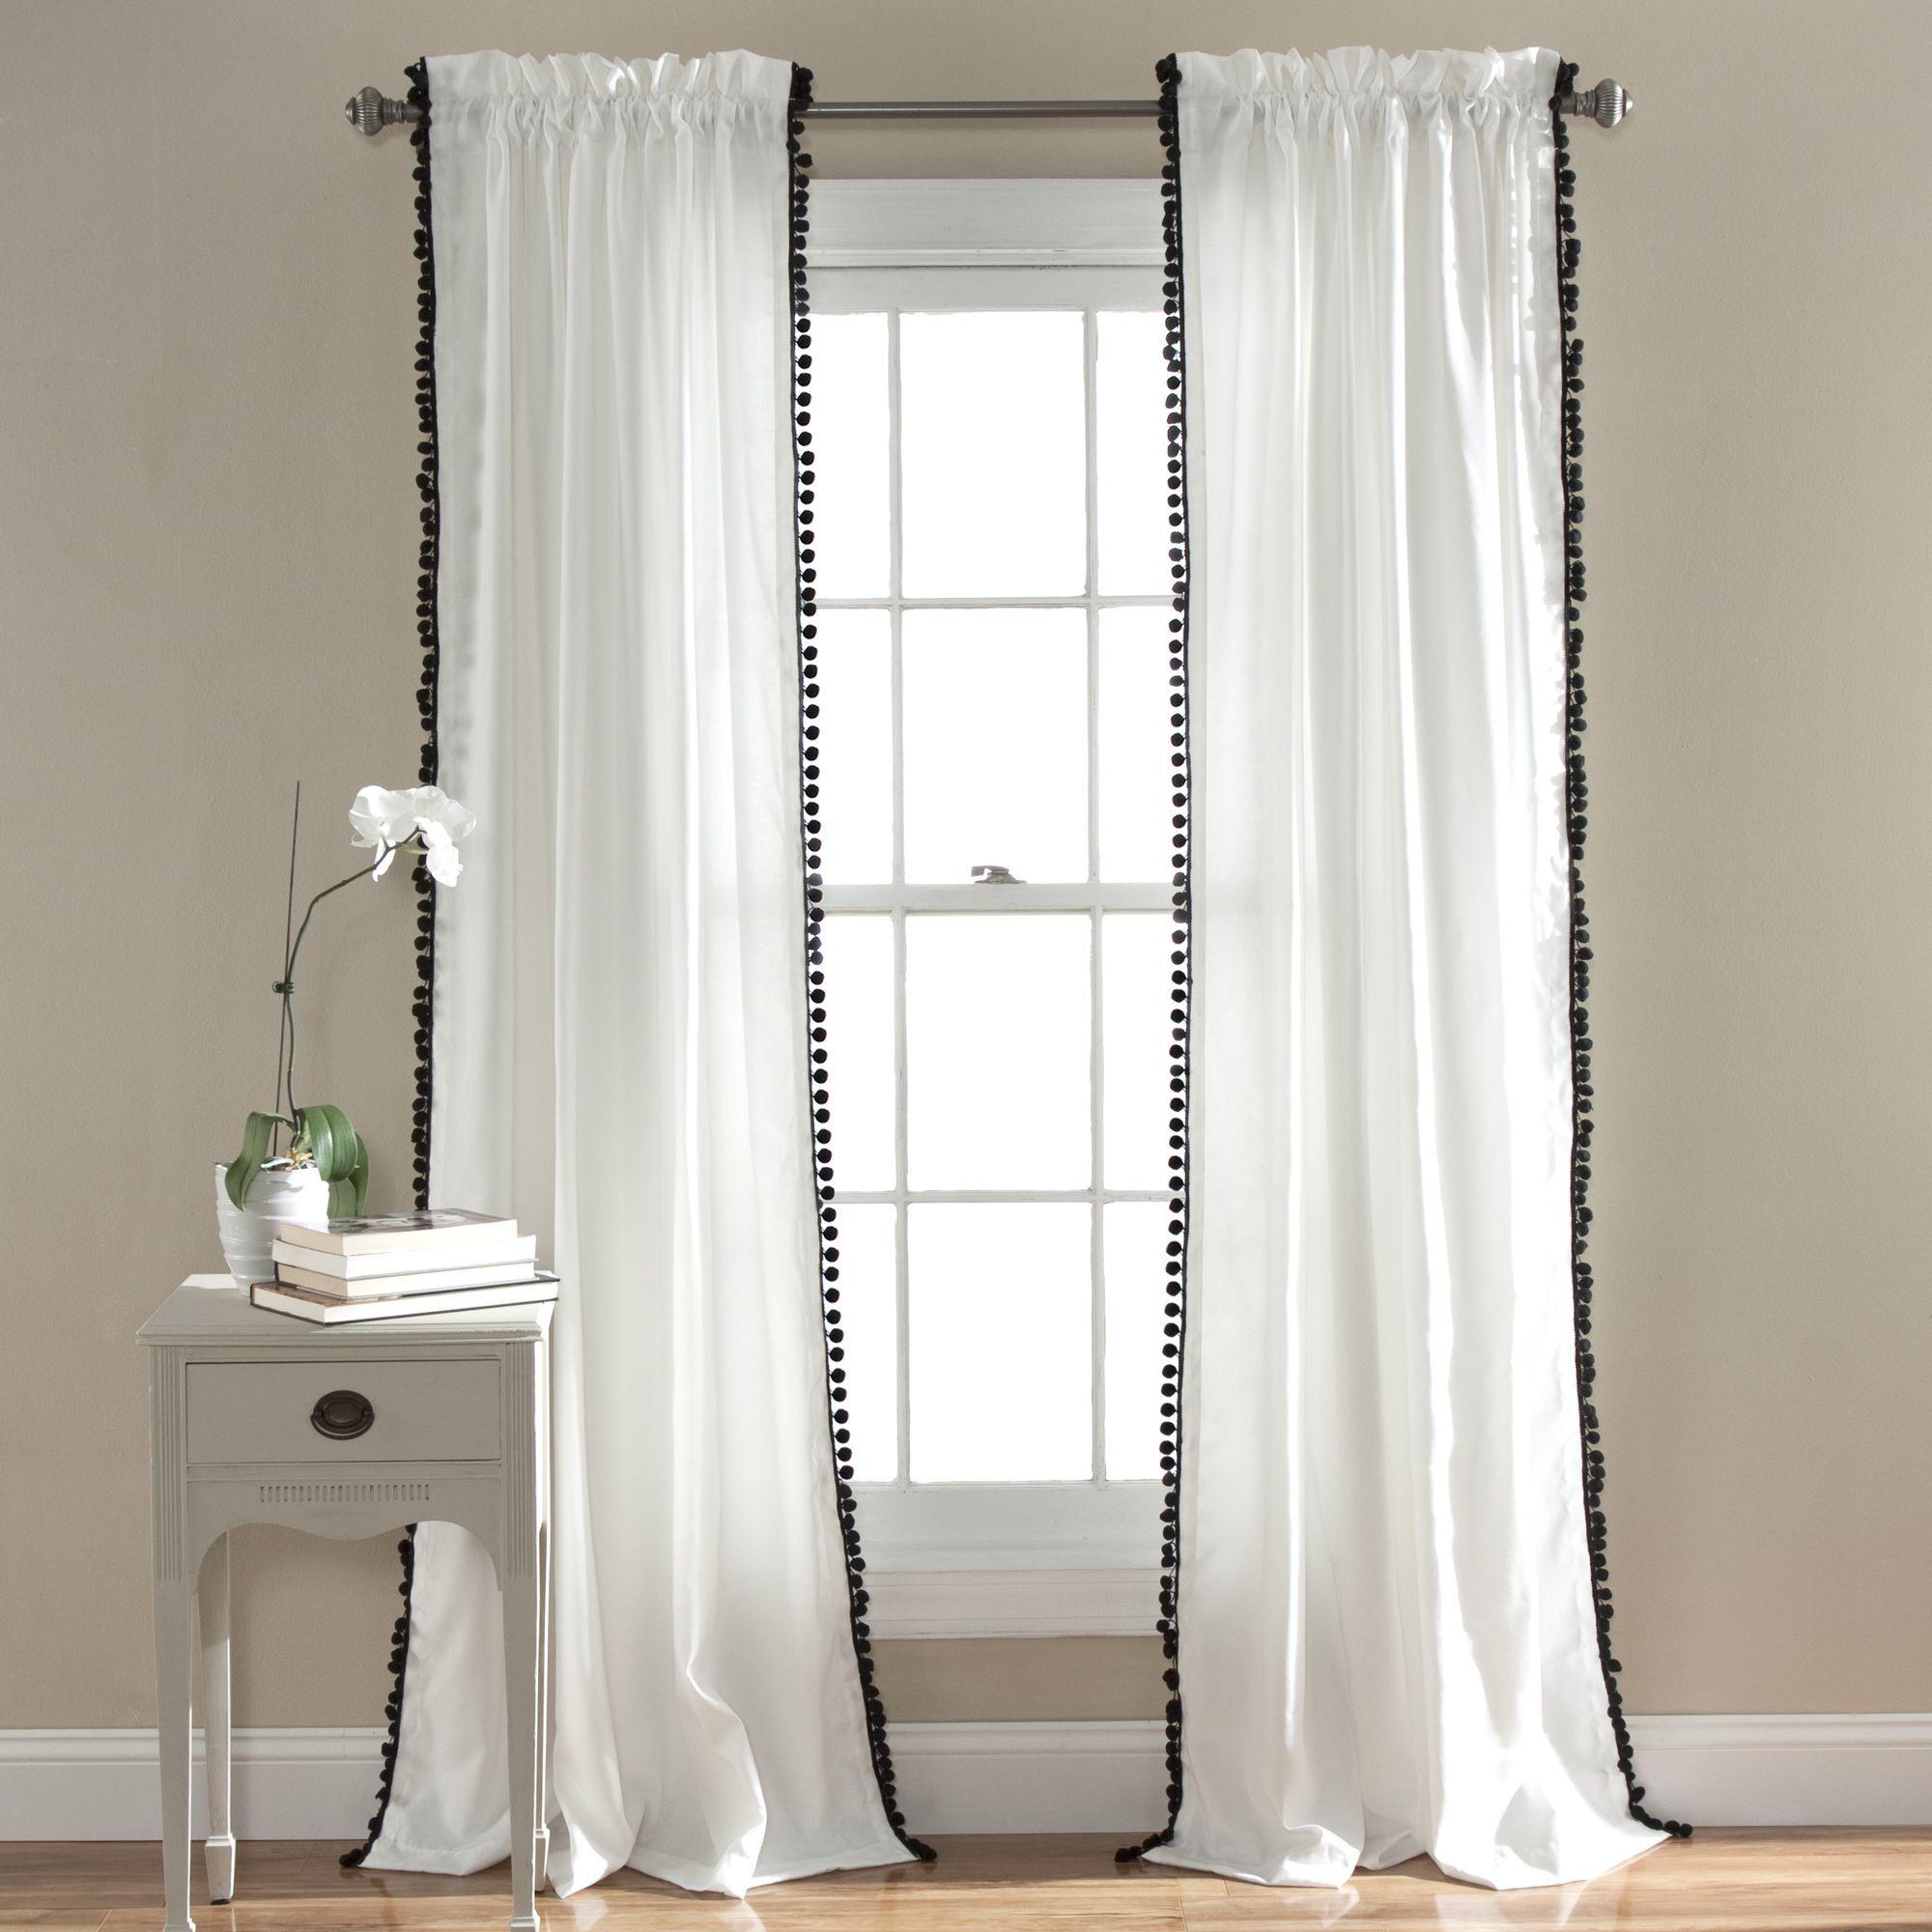 Lush Decor Pom 84 Inch Curtain Panel